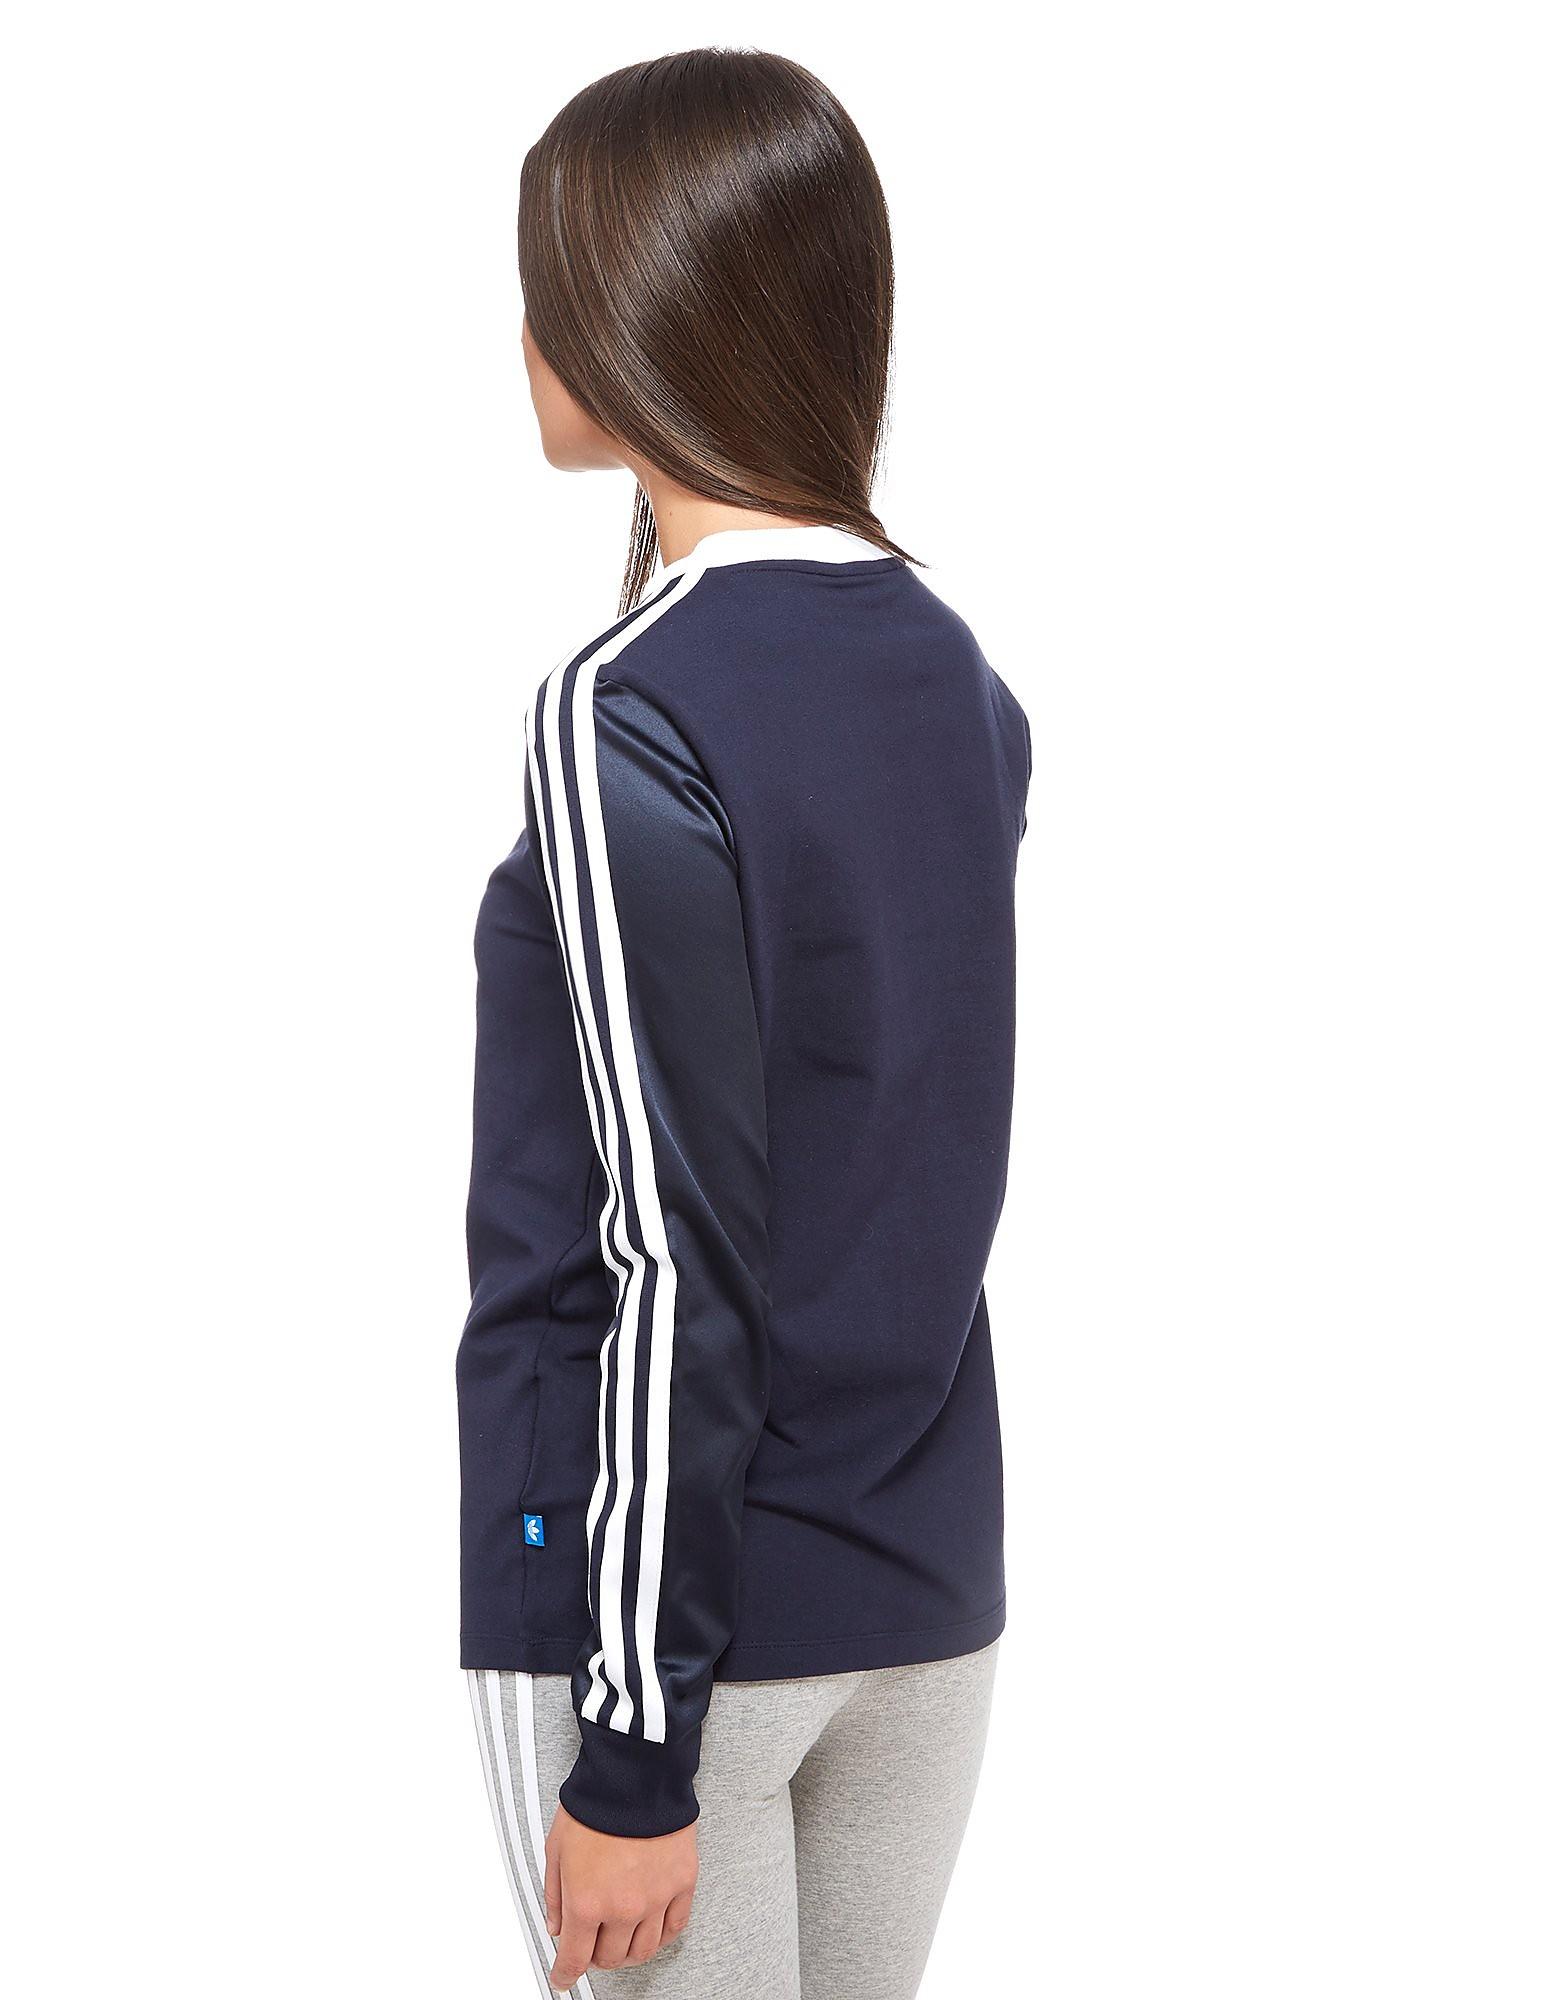 adidas Originals California Long-Sleeved T-Shirt